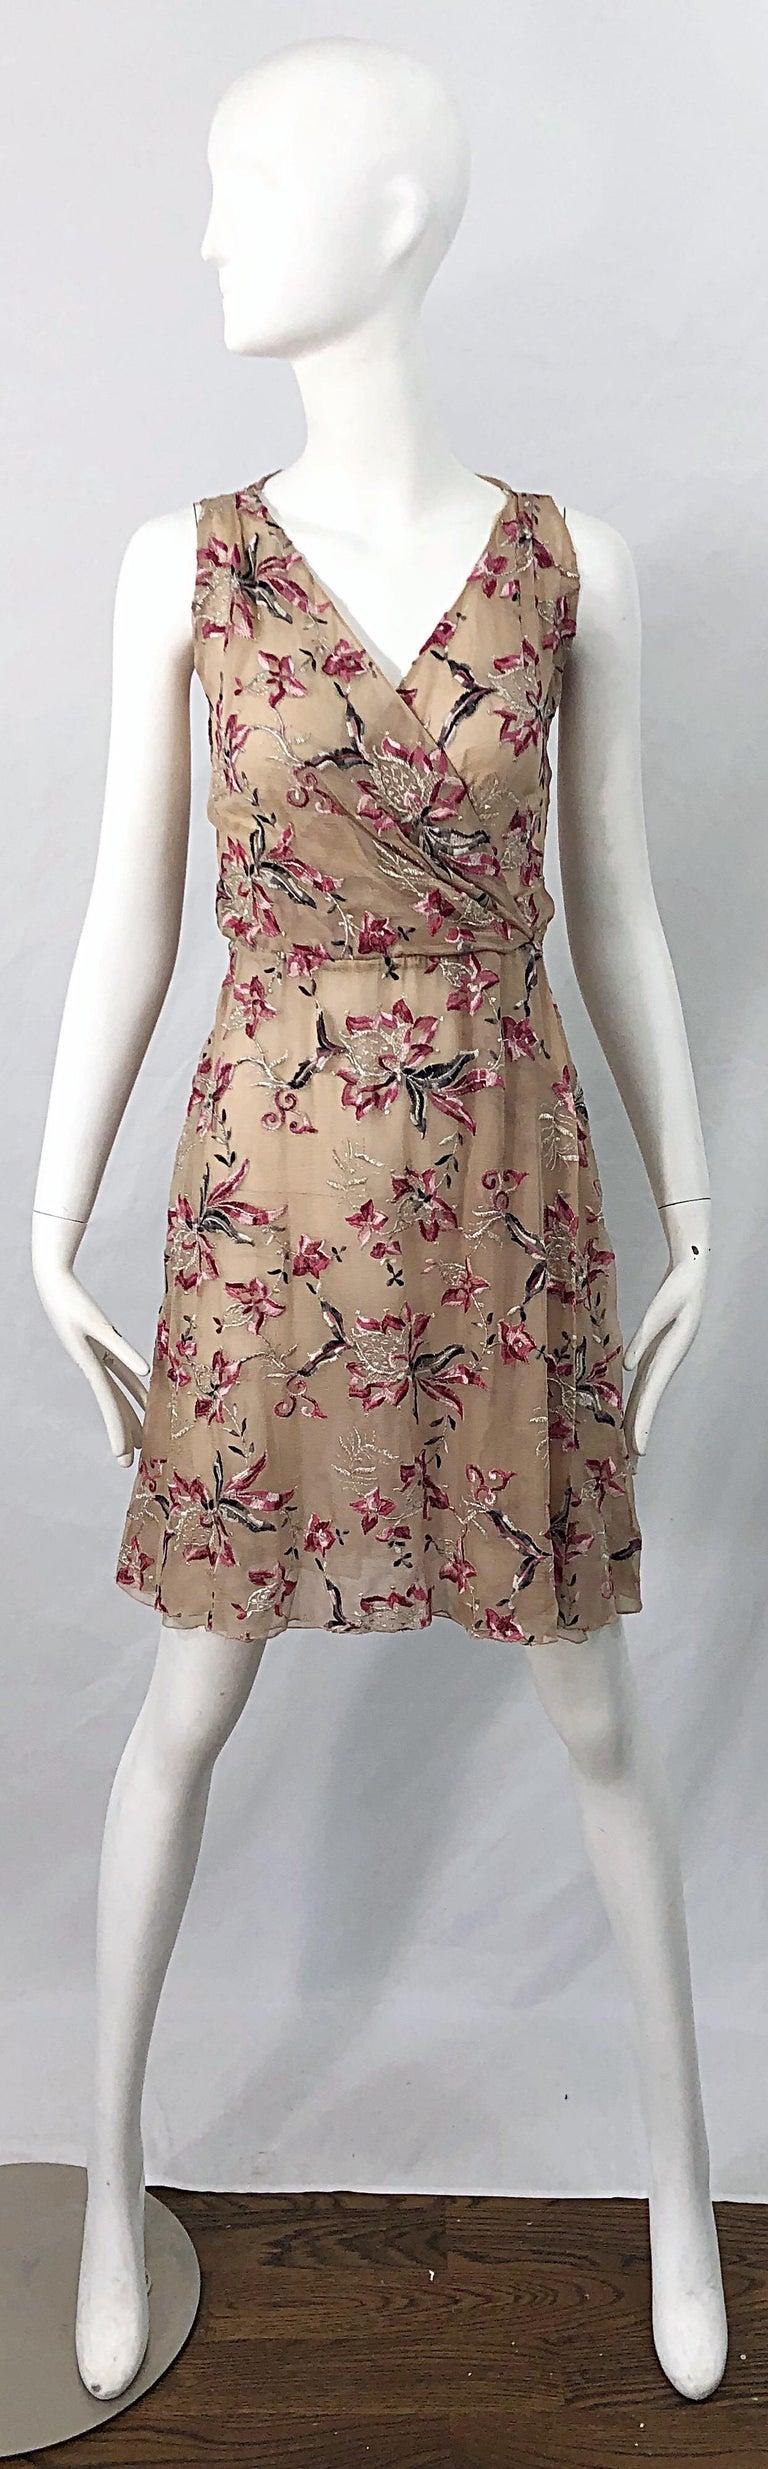 Beautiful 1990s Valentino Nude Silk Chiffon Semi Sheer Size 6 Embroidered Dress For Sale 7